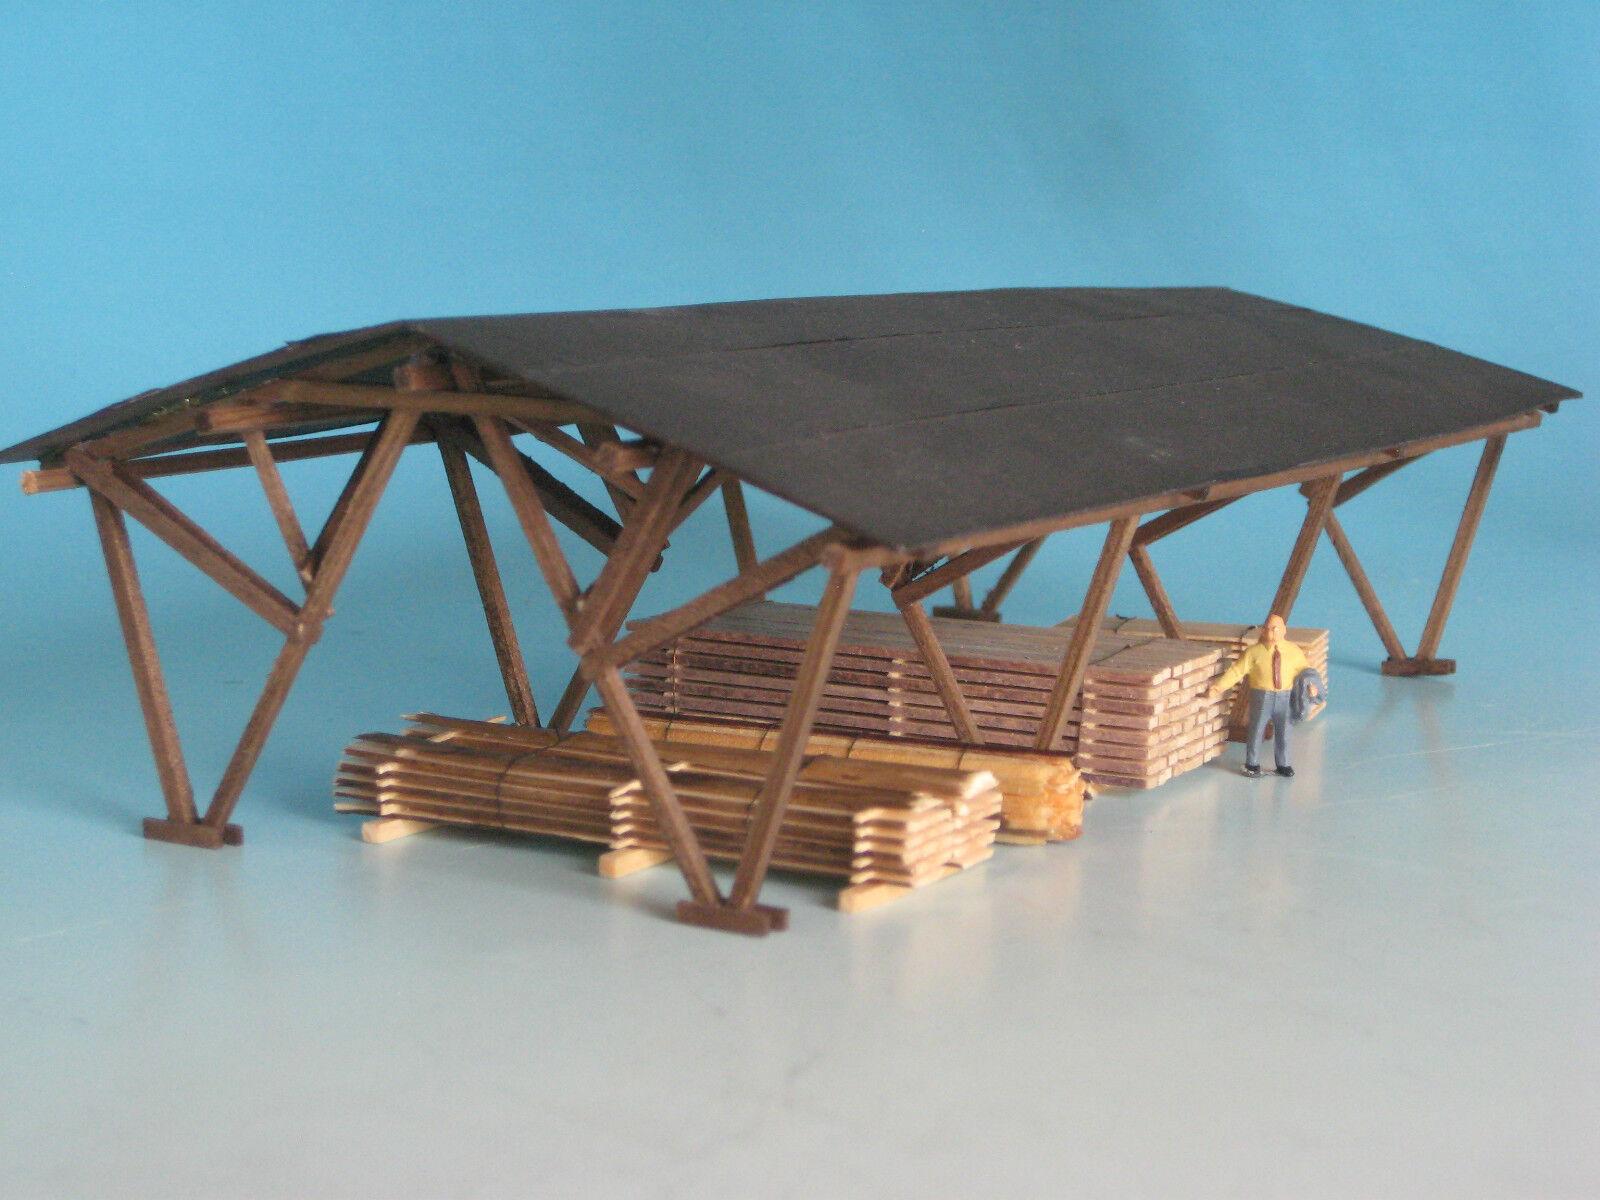 Duha 21160-Canopy-Handmade from real wood